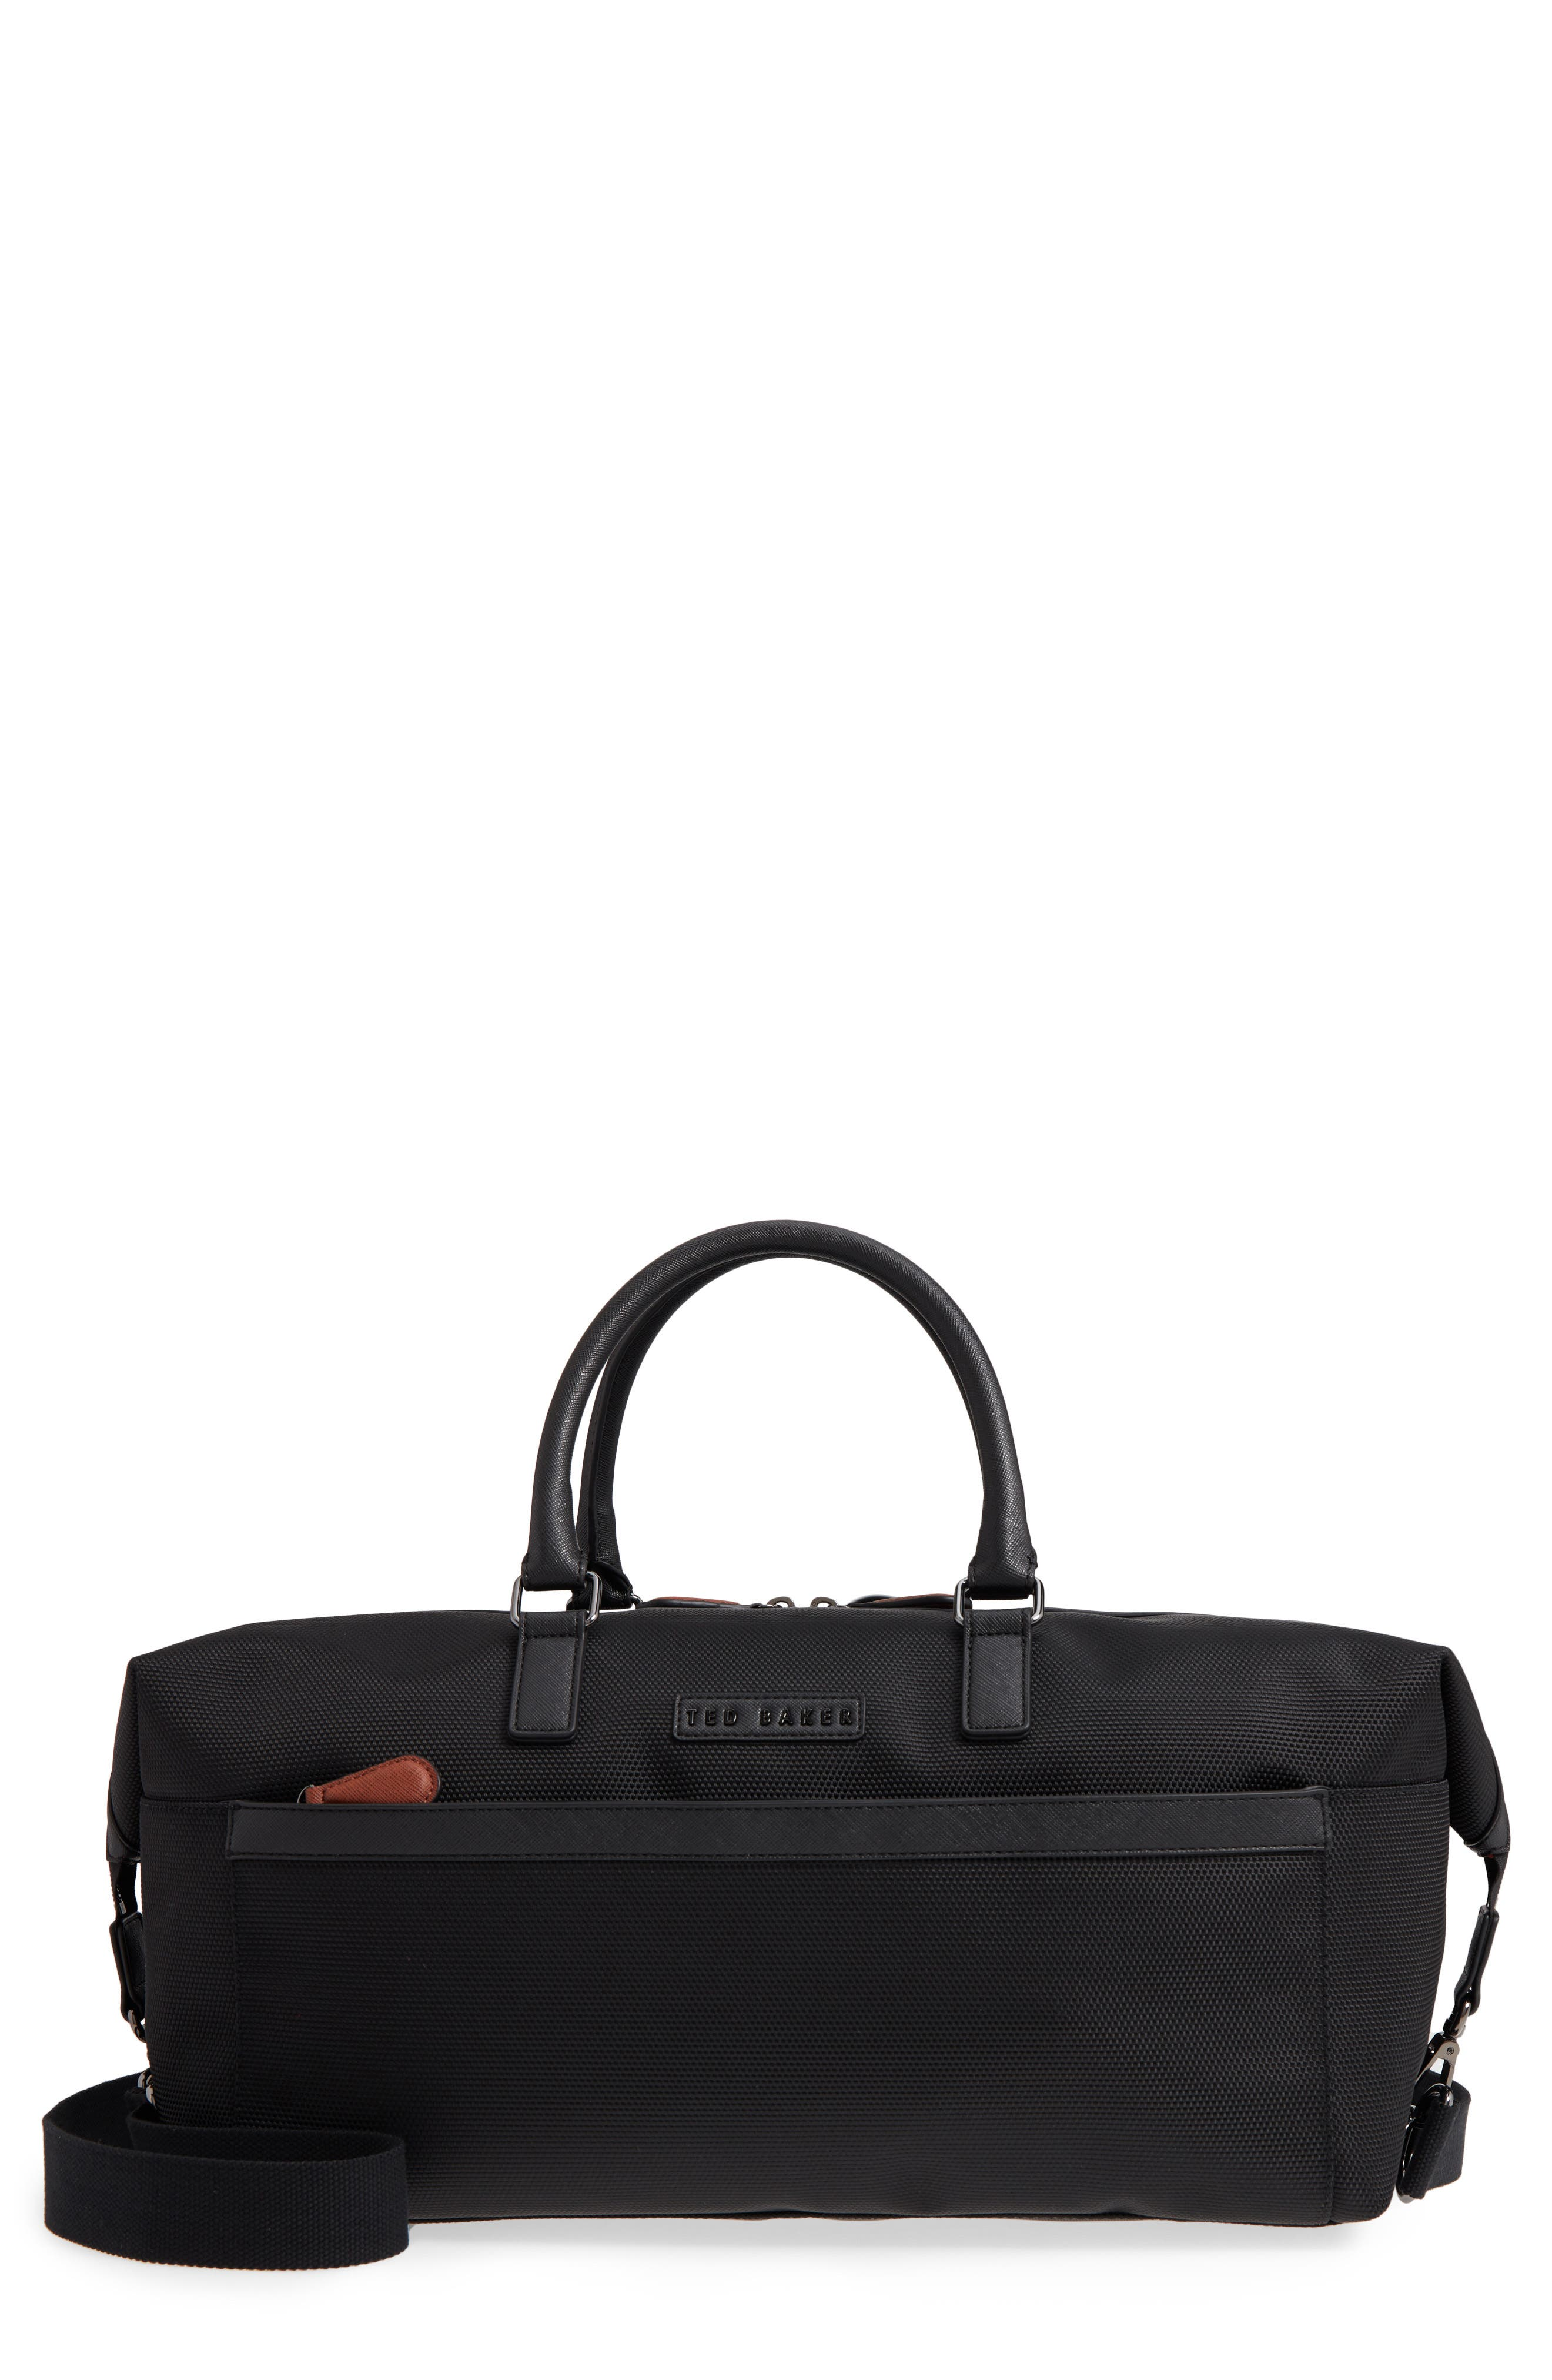 Smart Duffel Bag,                             Main thumbnail 1, color,                             001